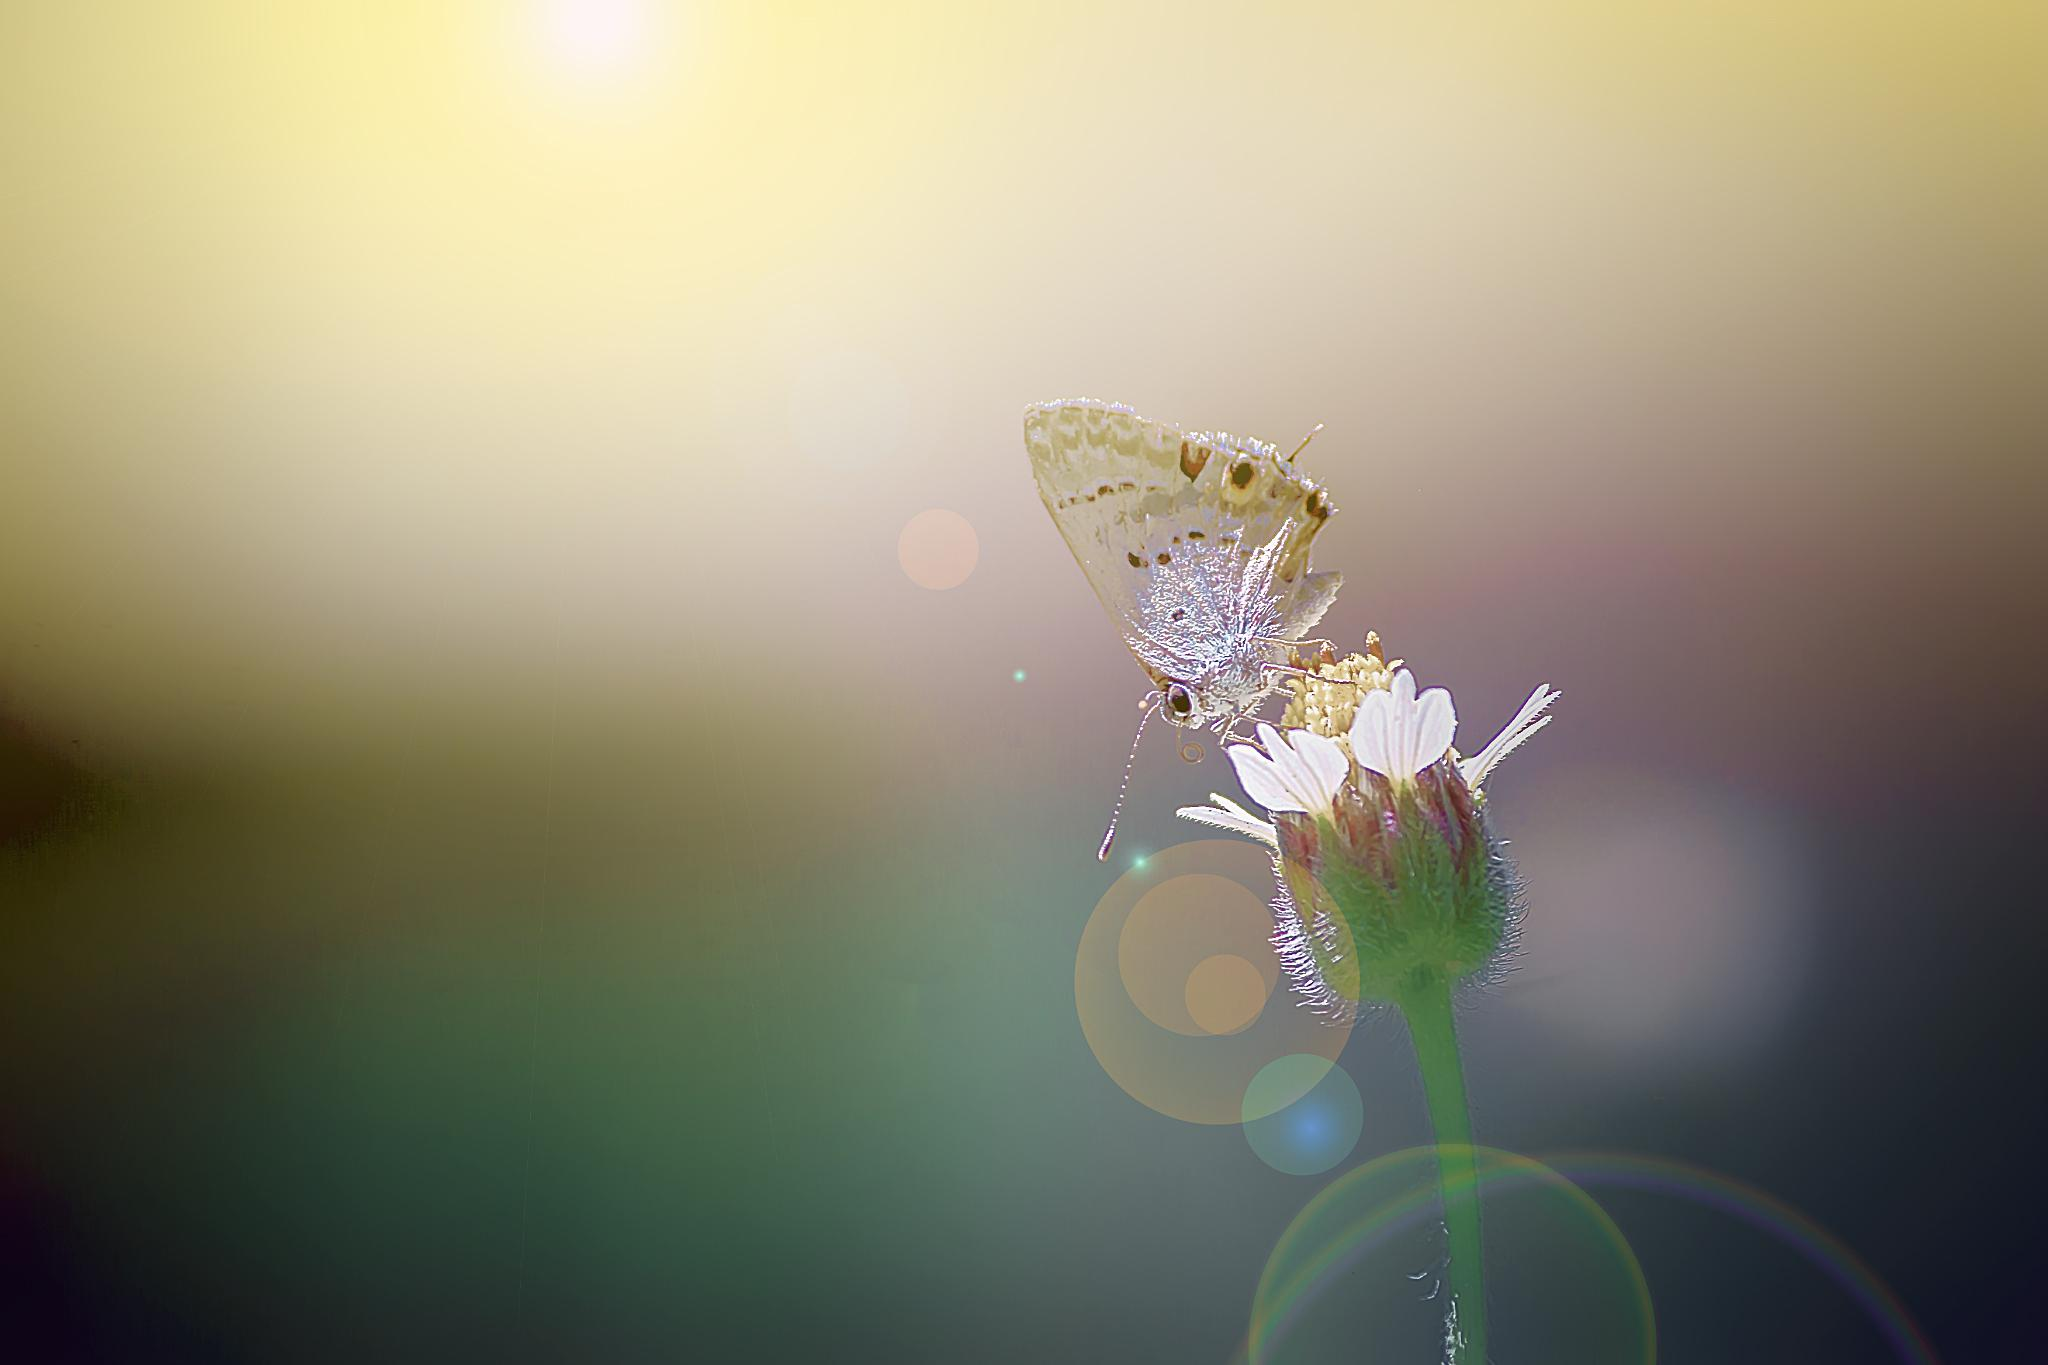 Facing the Sun 02 by Tony Guzman